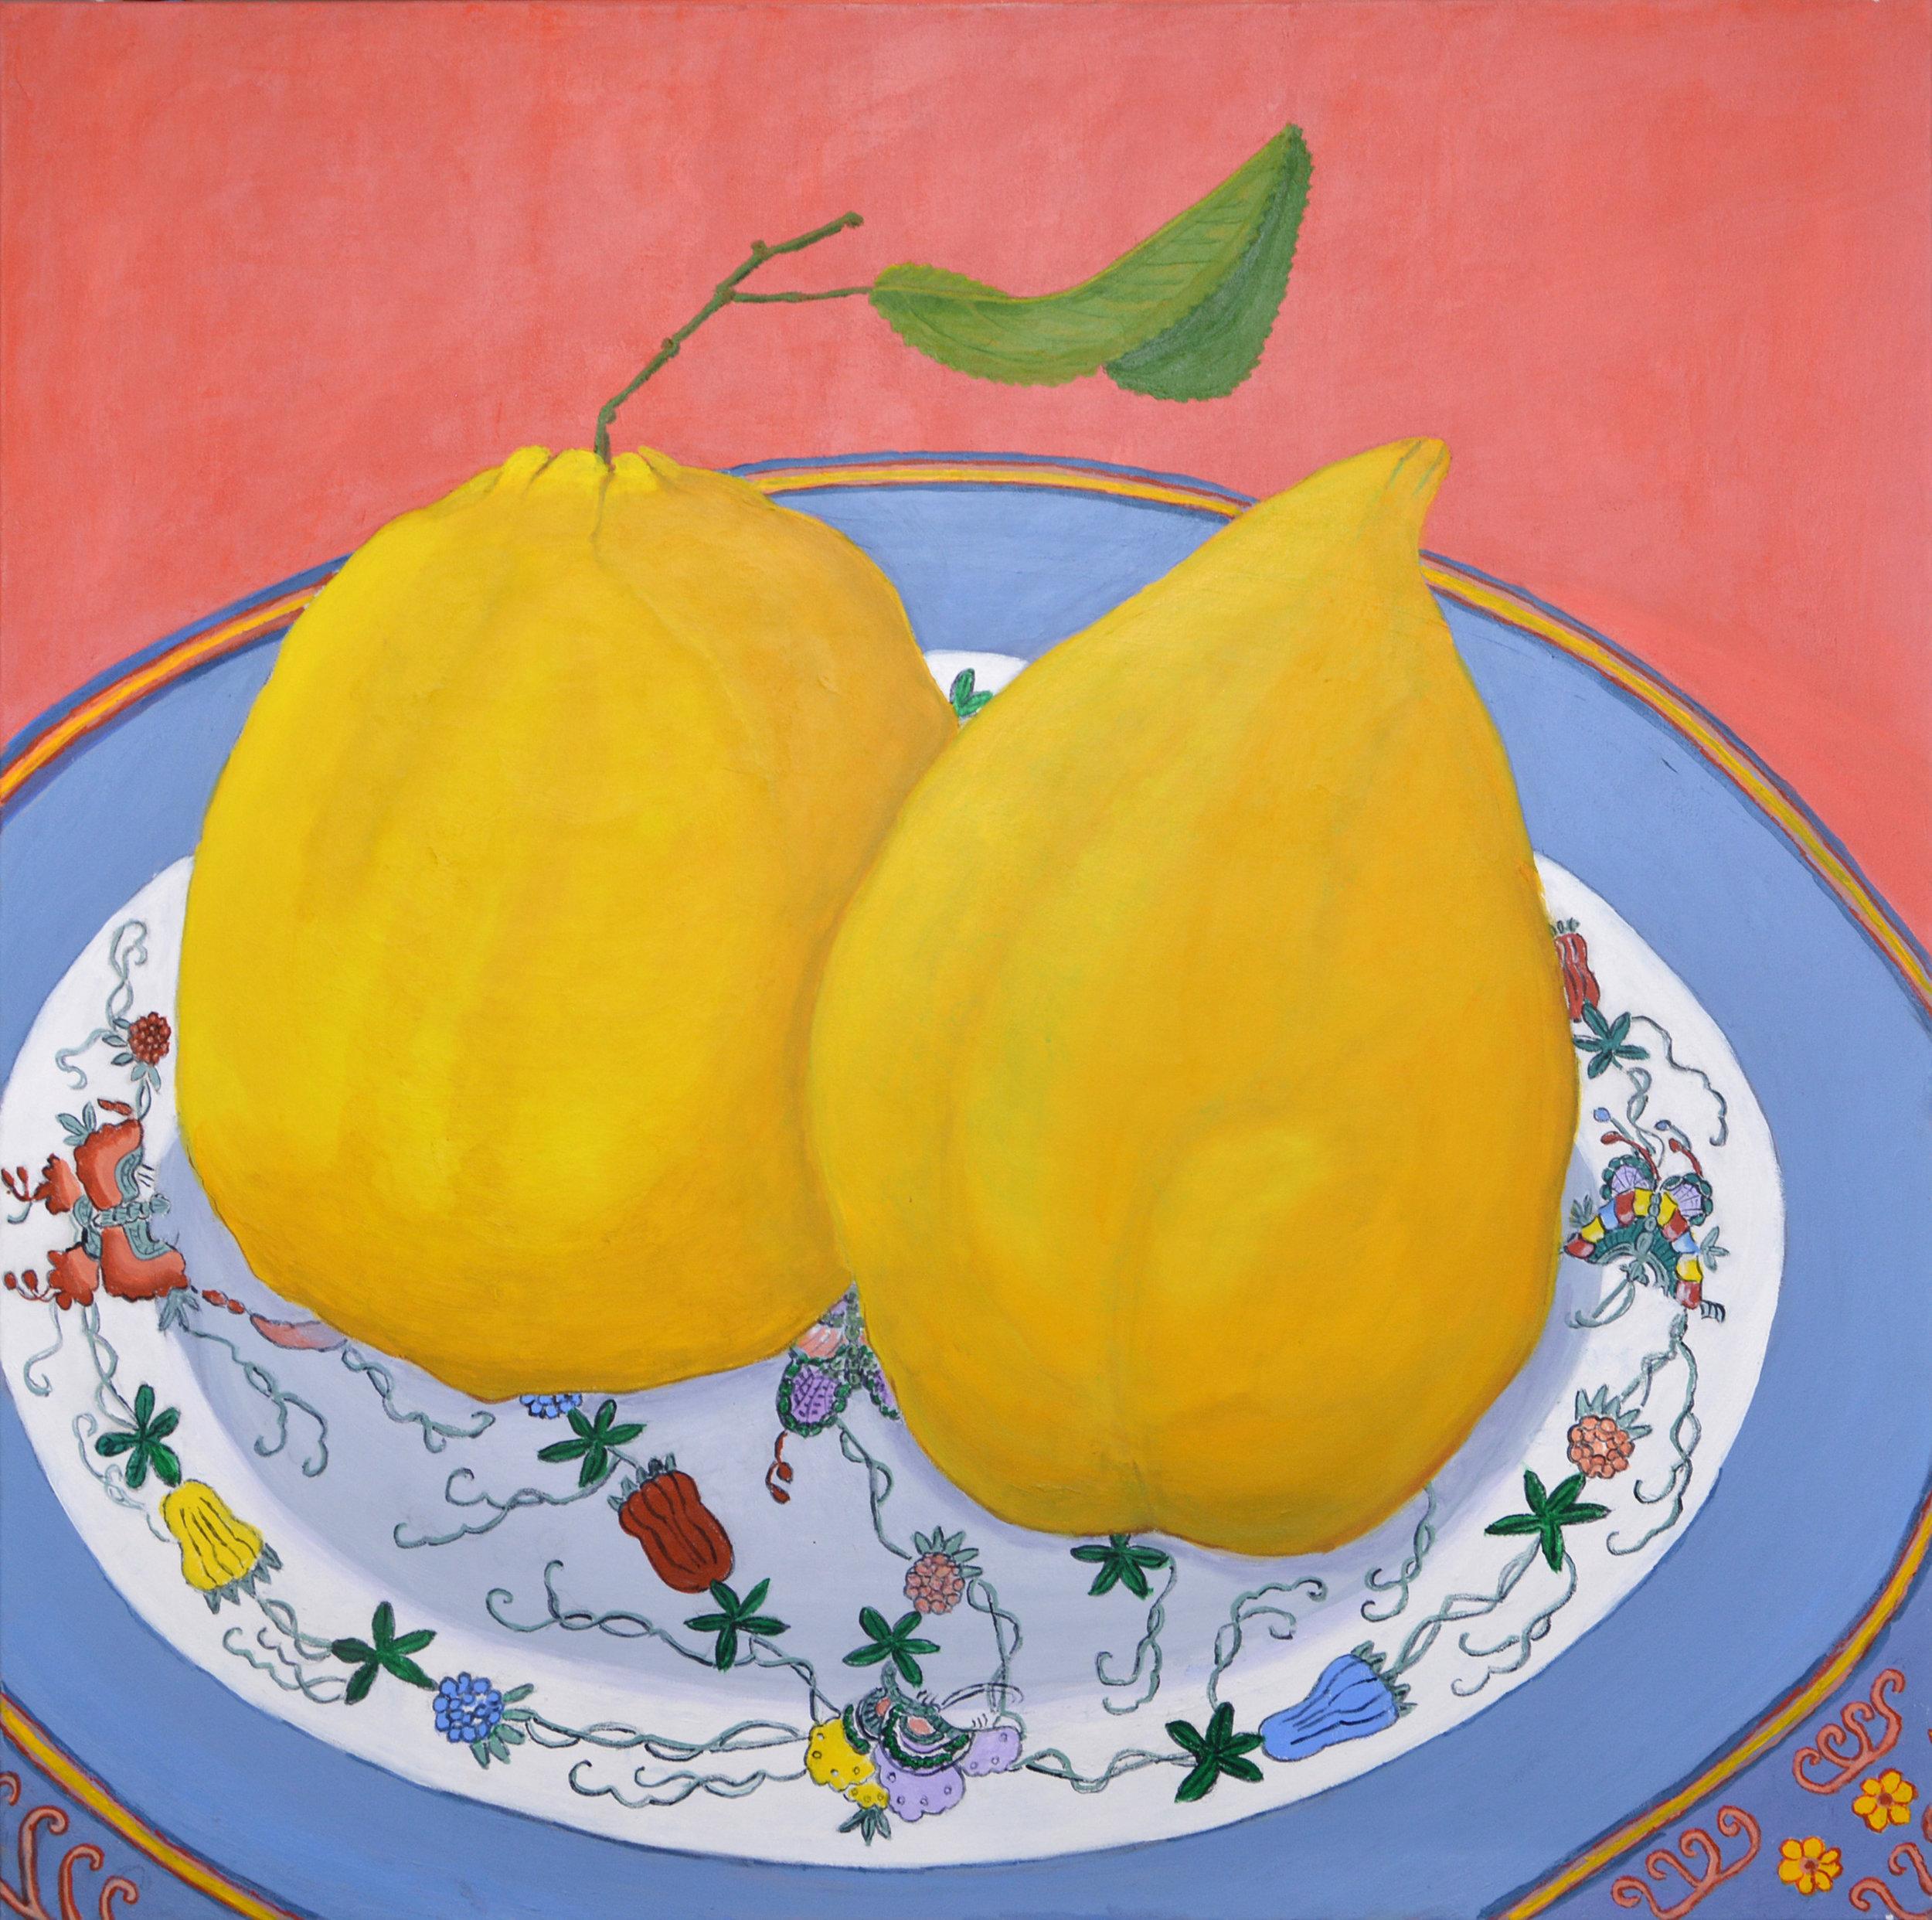 Mervyn Seldon, Two Lemons